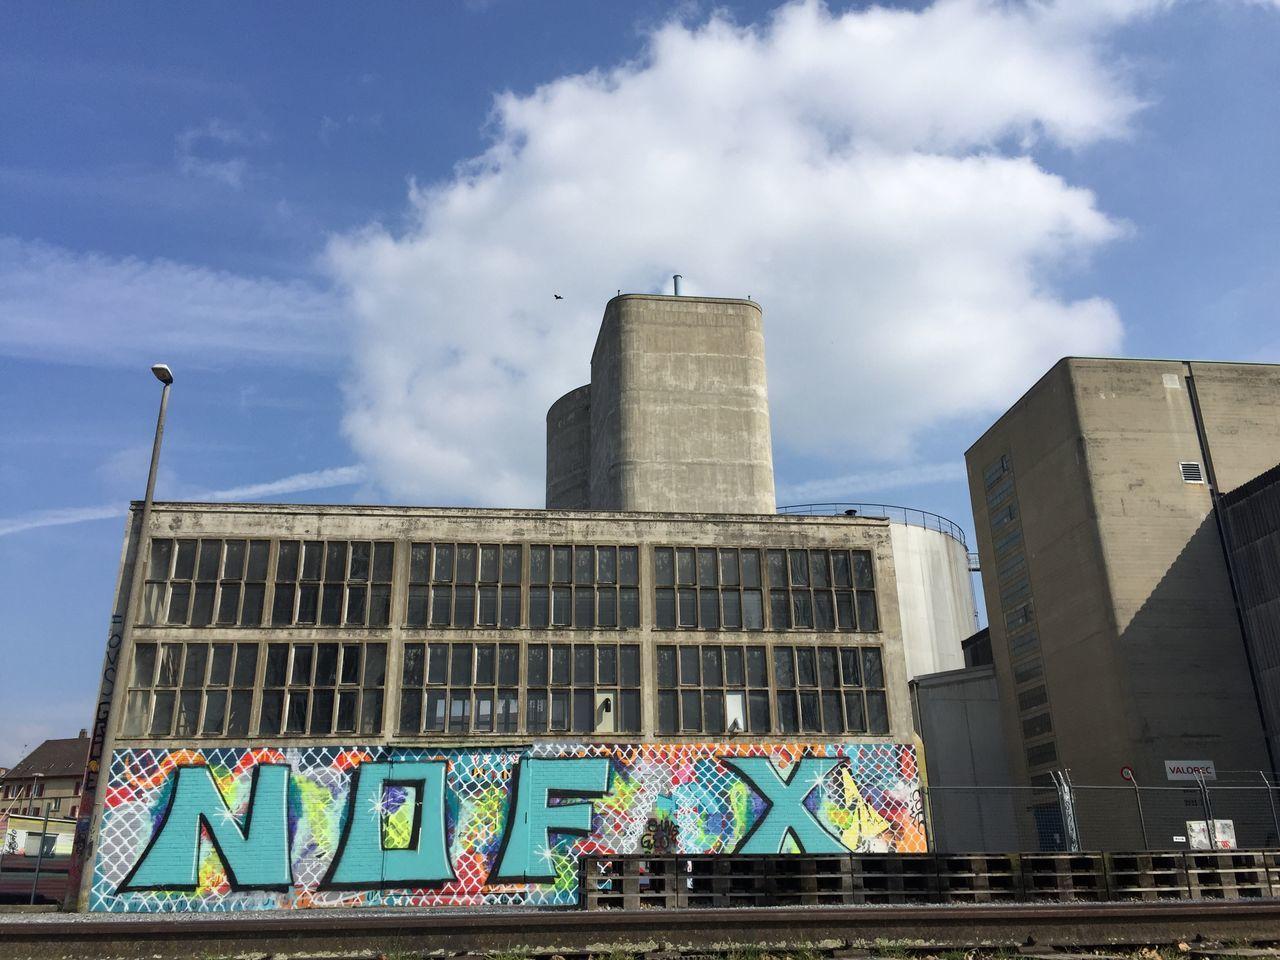 Basle, Graffiti The Architect - 2016 EyeEm Awards